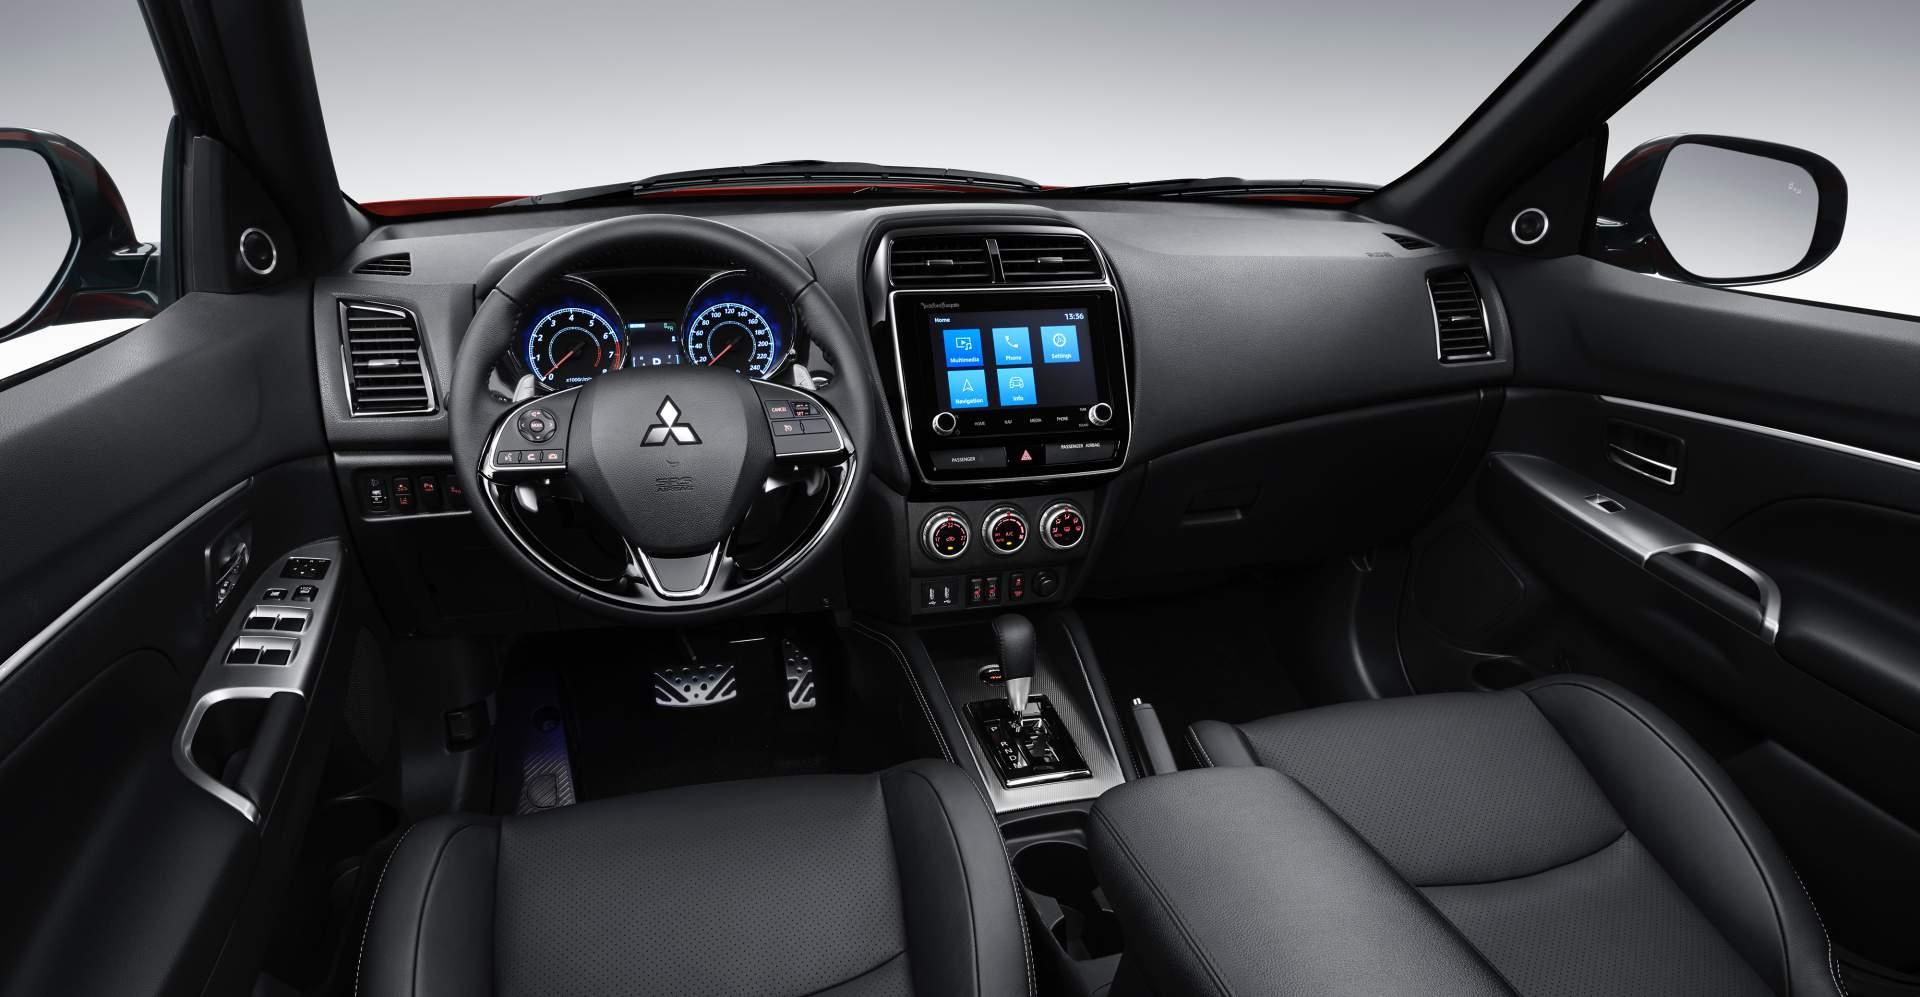 Mitsubishi ASX facelift 2019 (30)